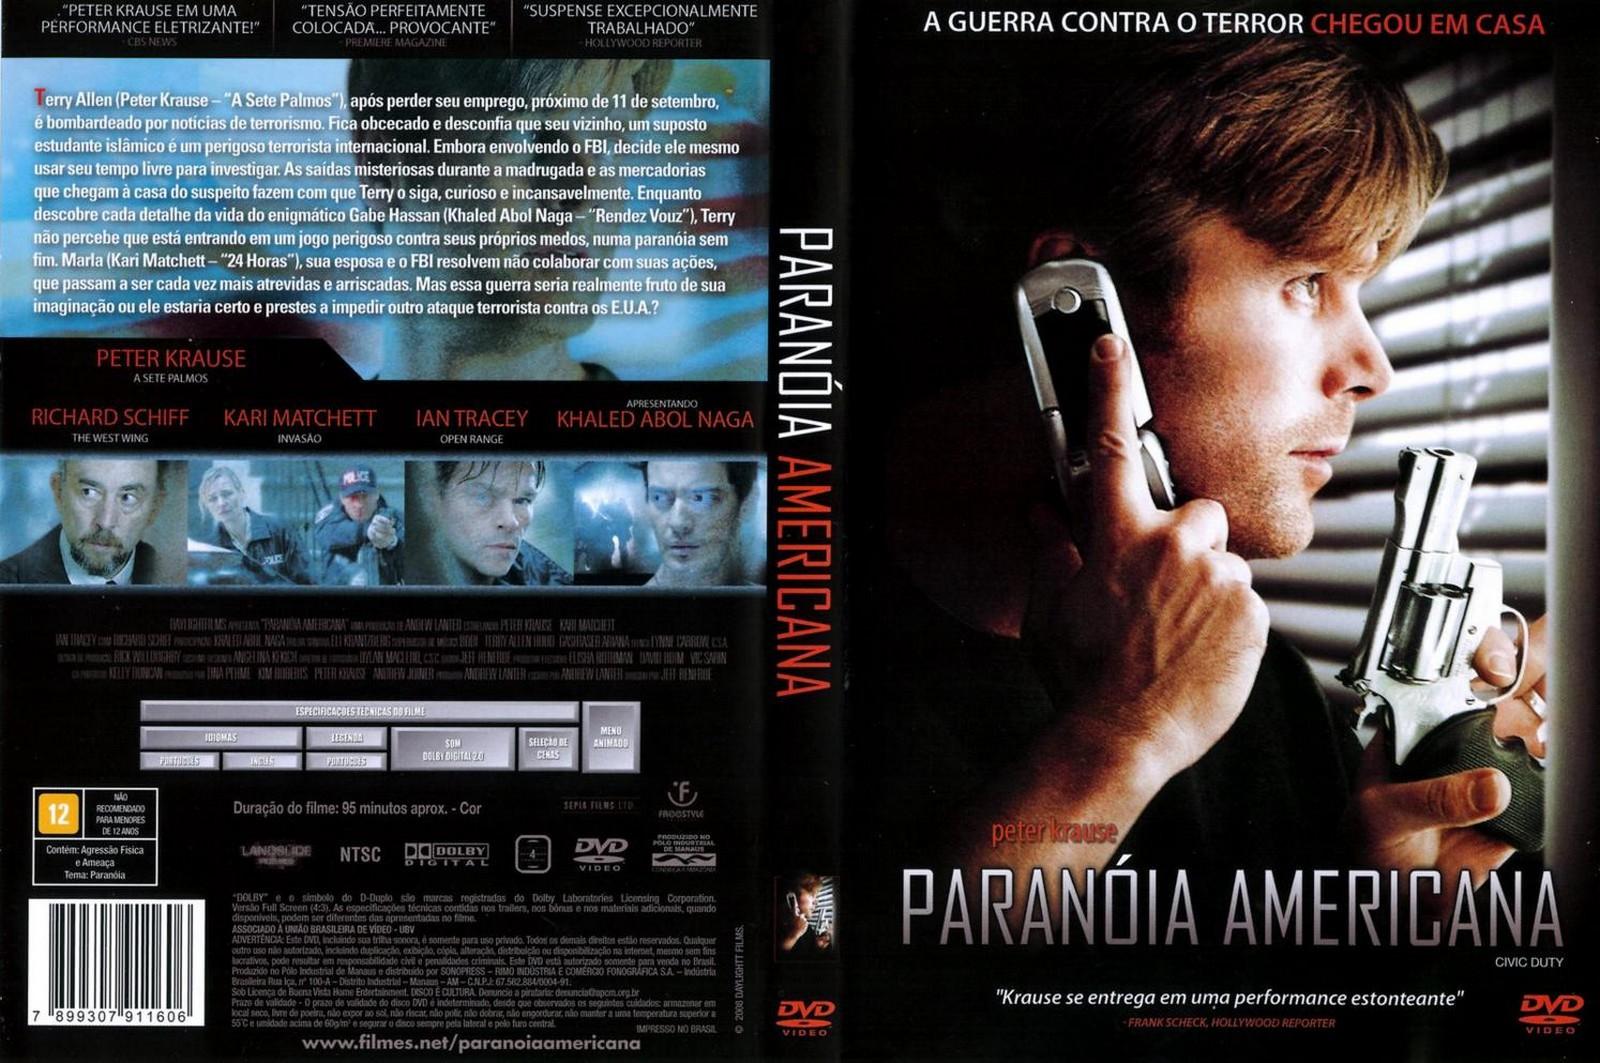 http://3.bp.blogspot.com/_56N_enXK-4o/TEnQDfYuB6I/AAAAAAAAAP8/-dtnfarw7hs/s1600/Paranoia-Americana.jpg